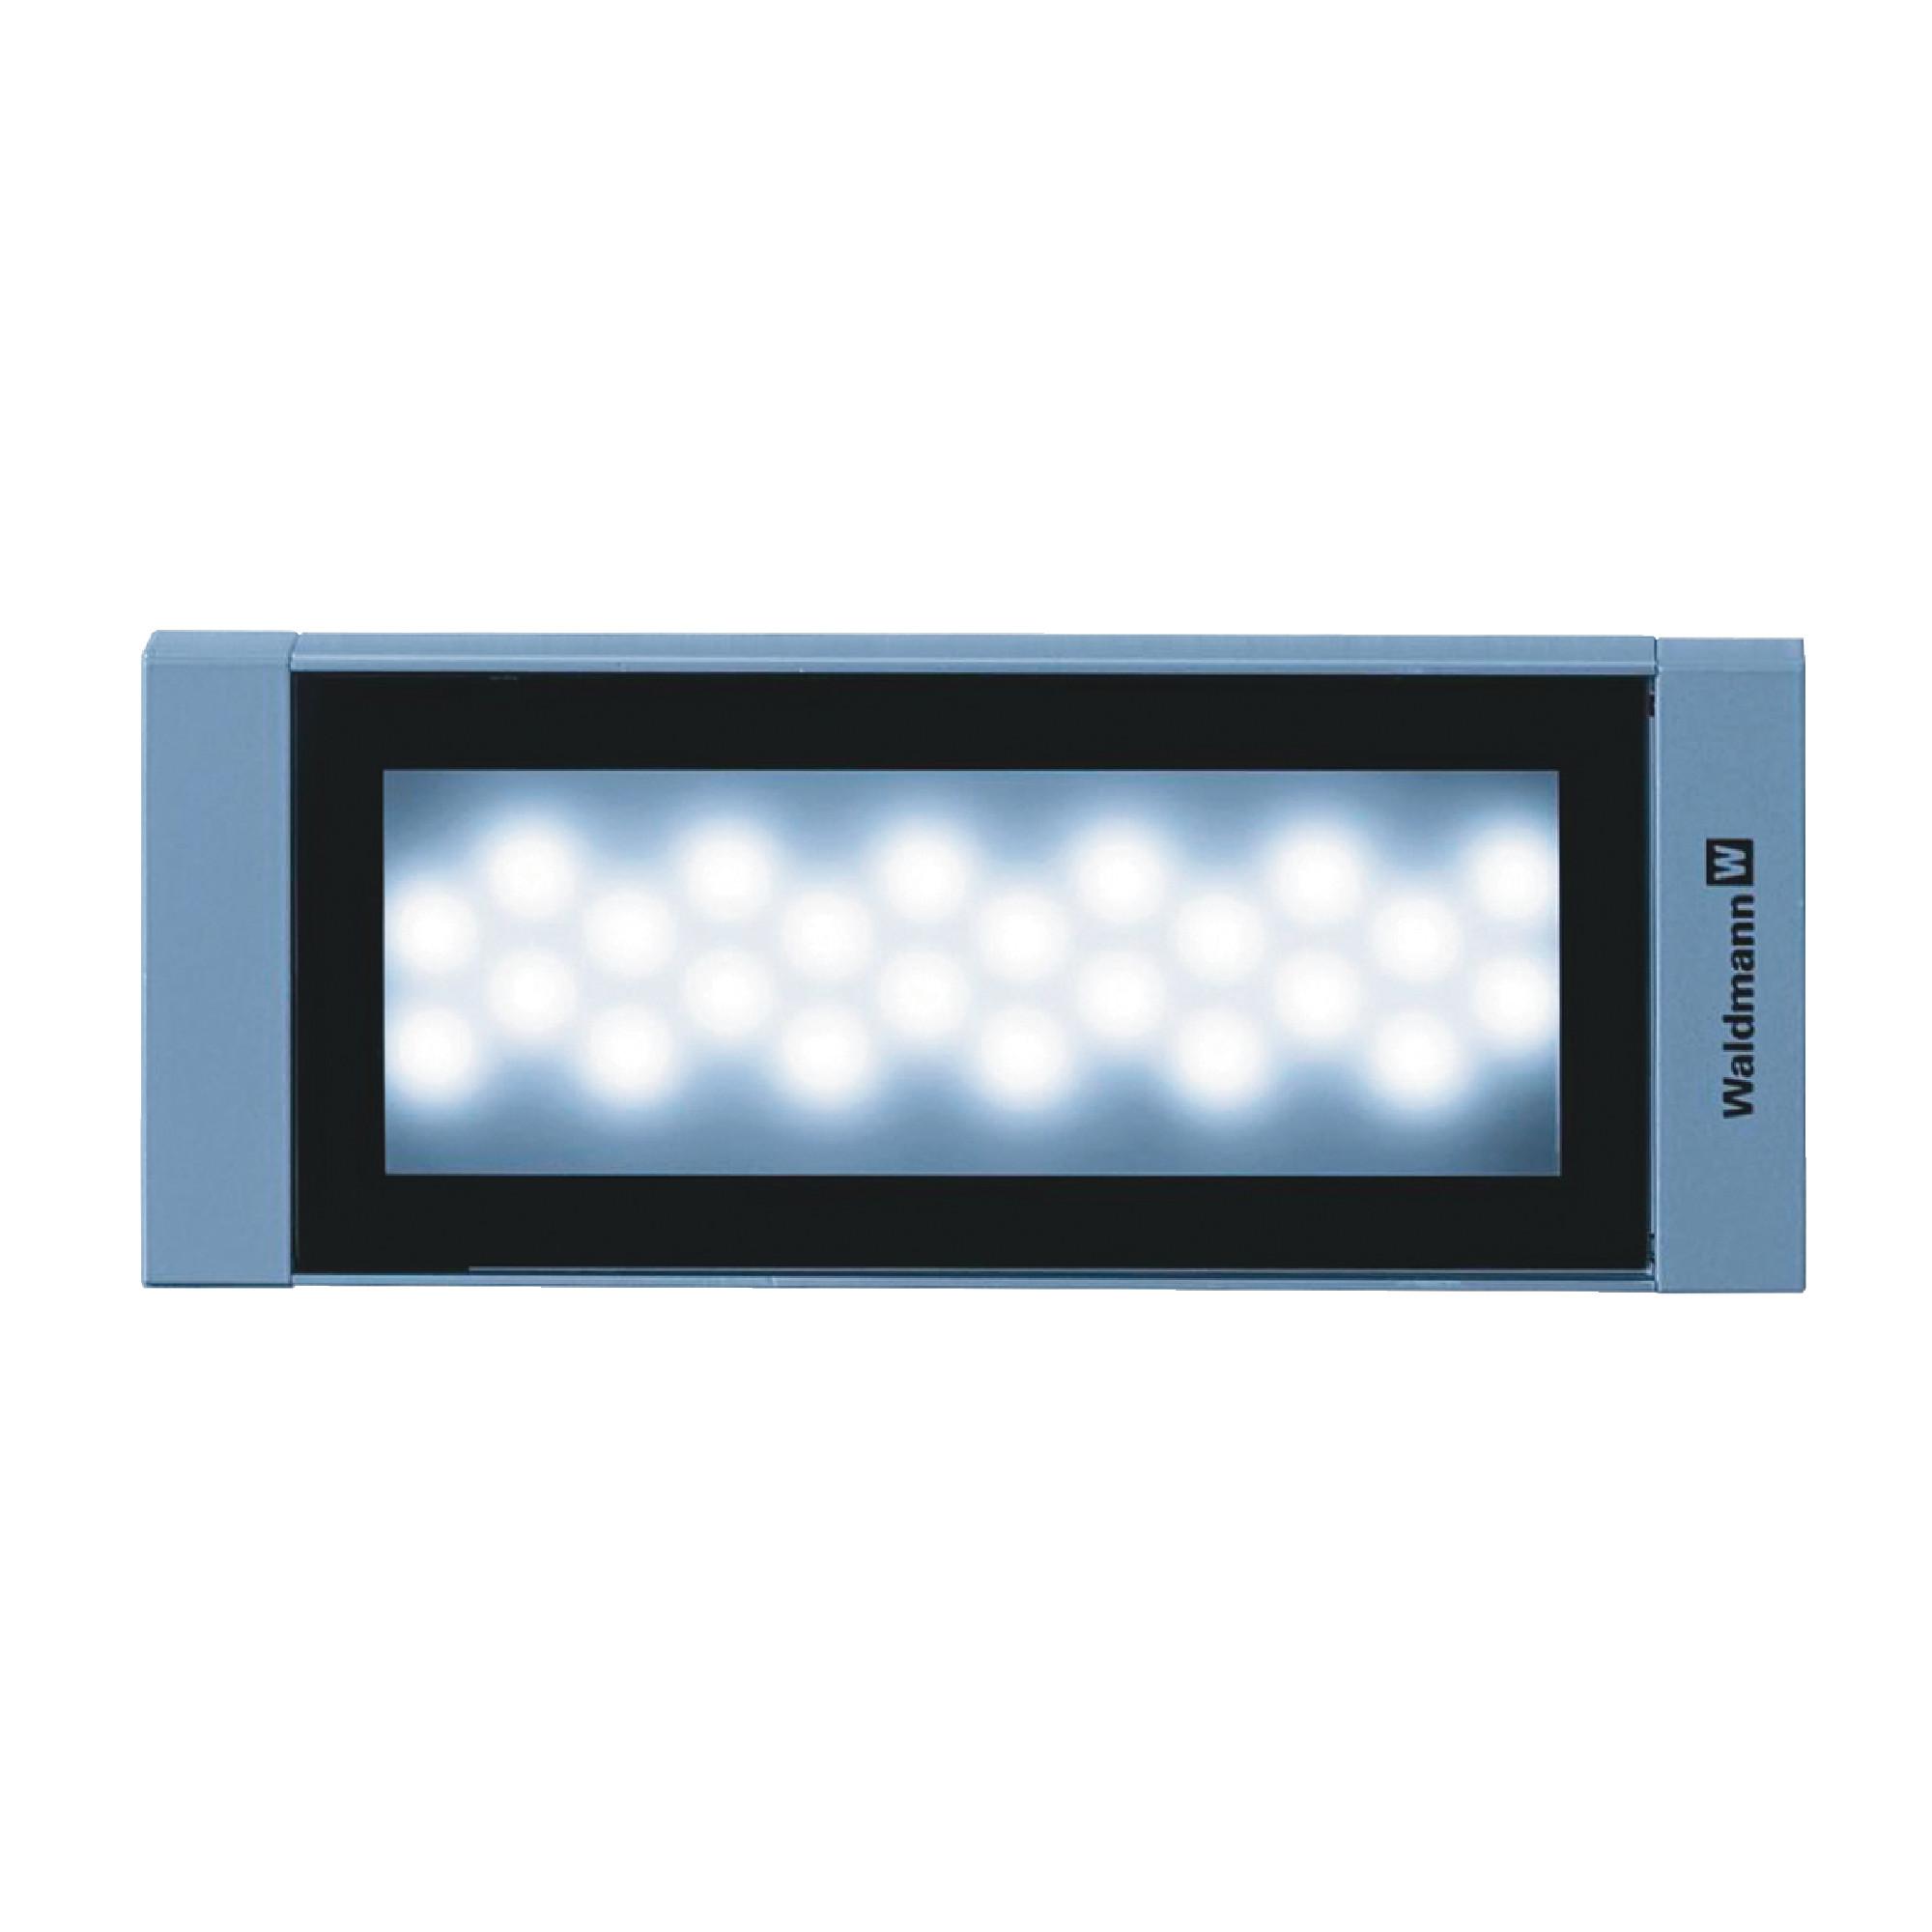 WALDMANN LIGHTING LED High Output Machine Light